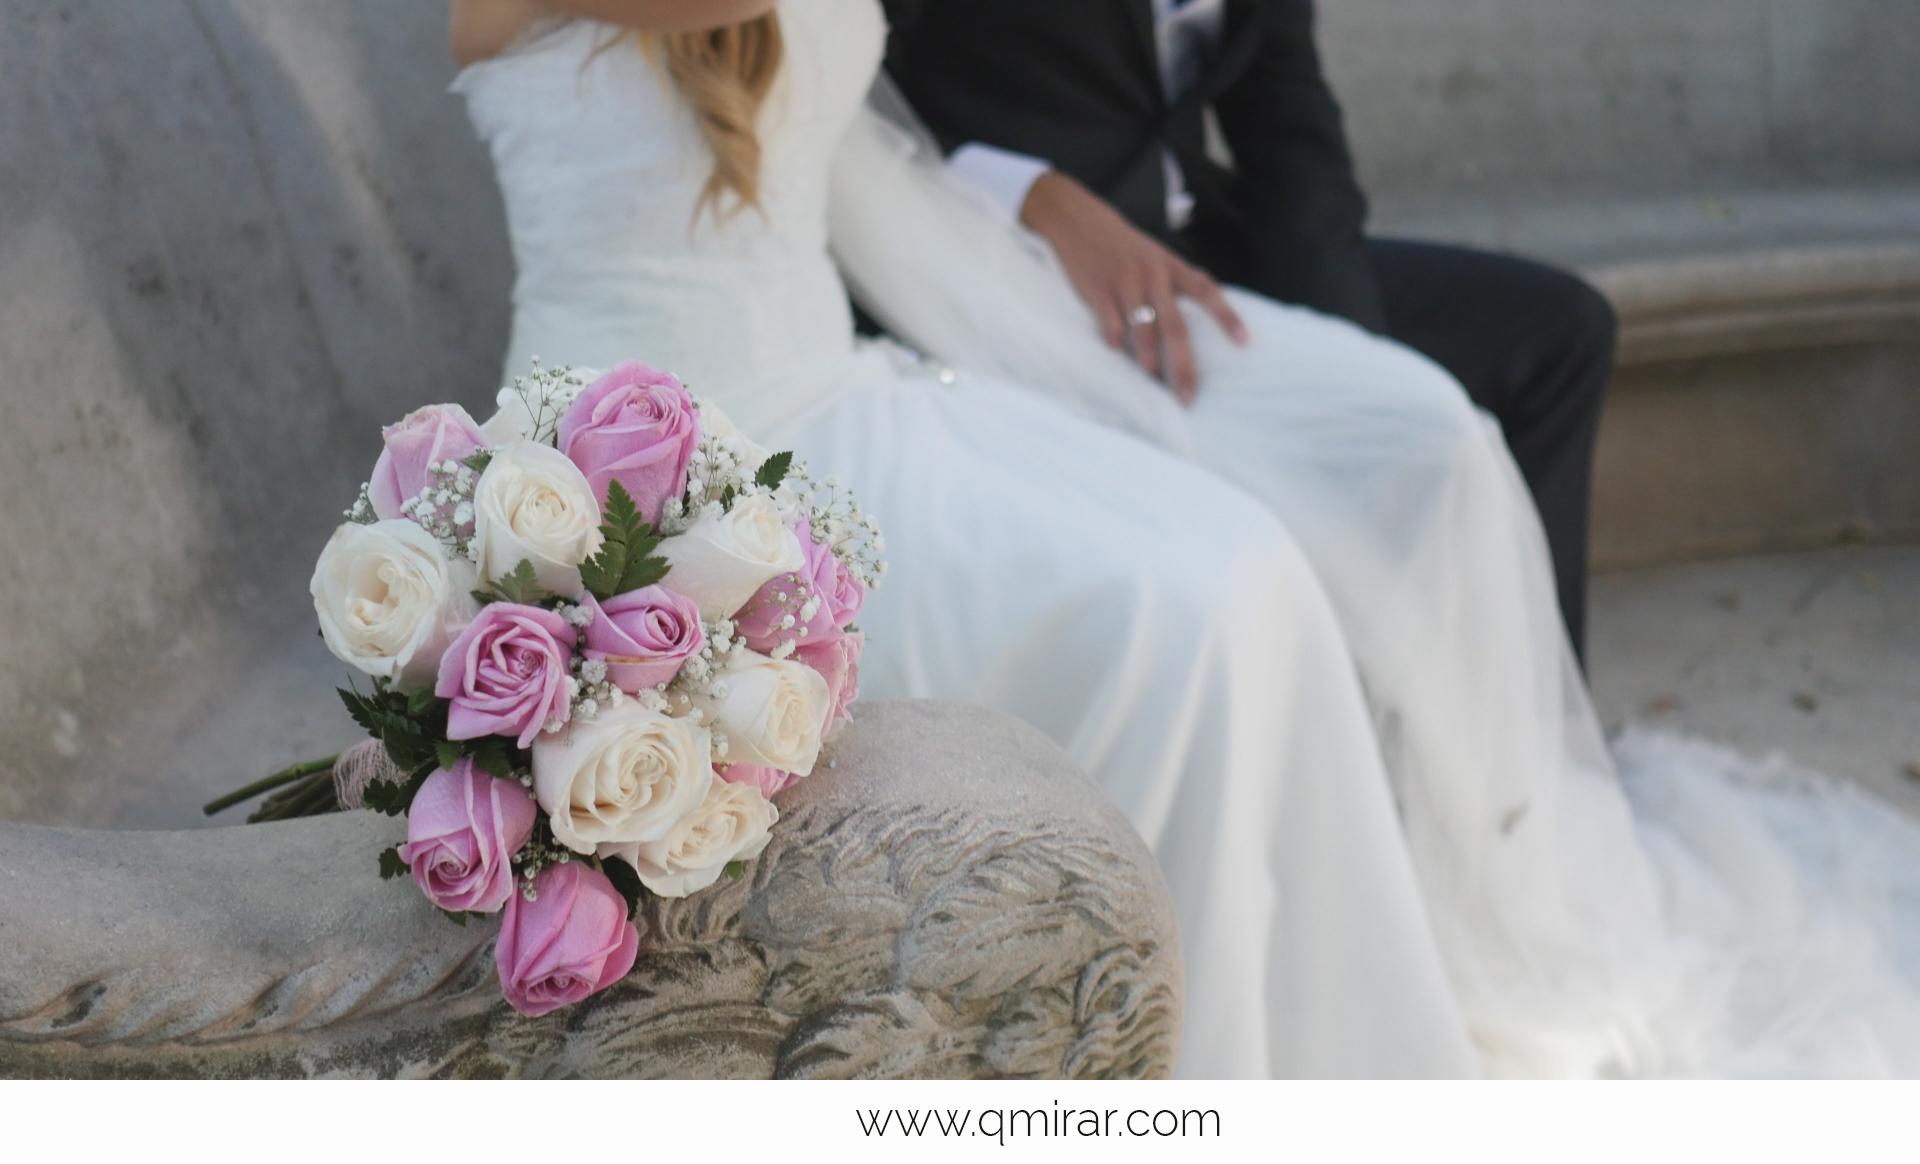 Pedida de mano,qmirar,videos,bodas,boda,wedding,videografo,filmaker,silvia oliveros